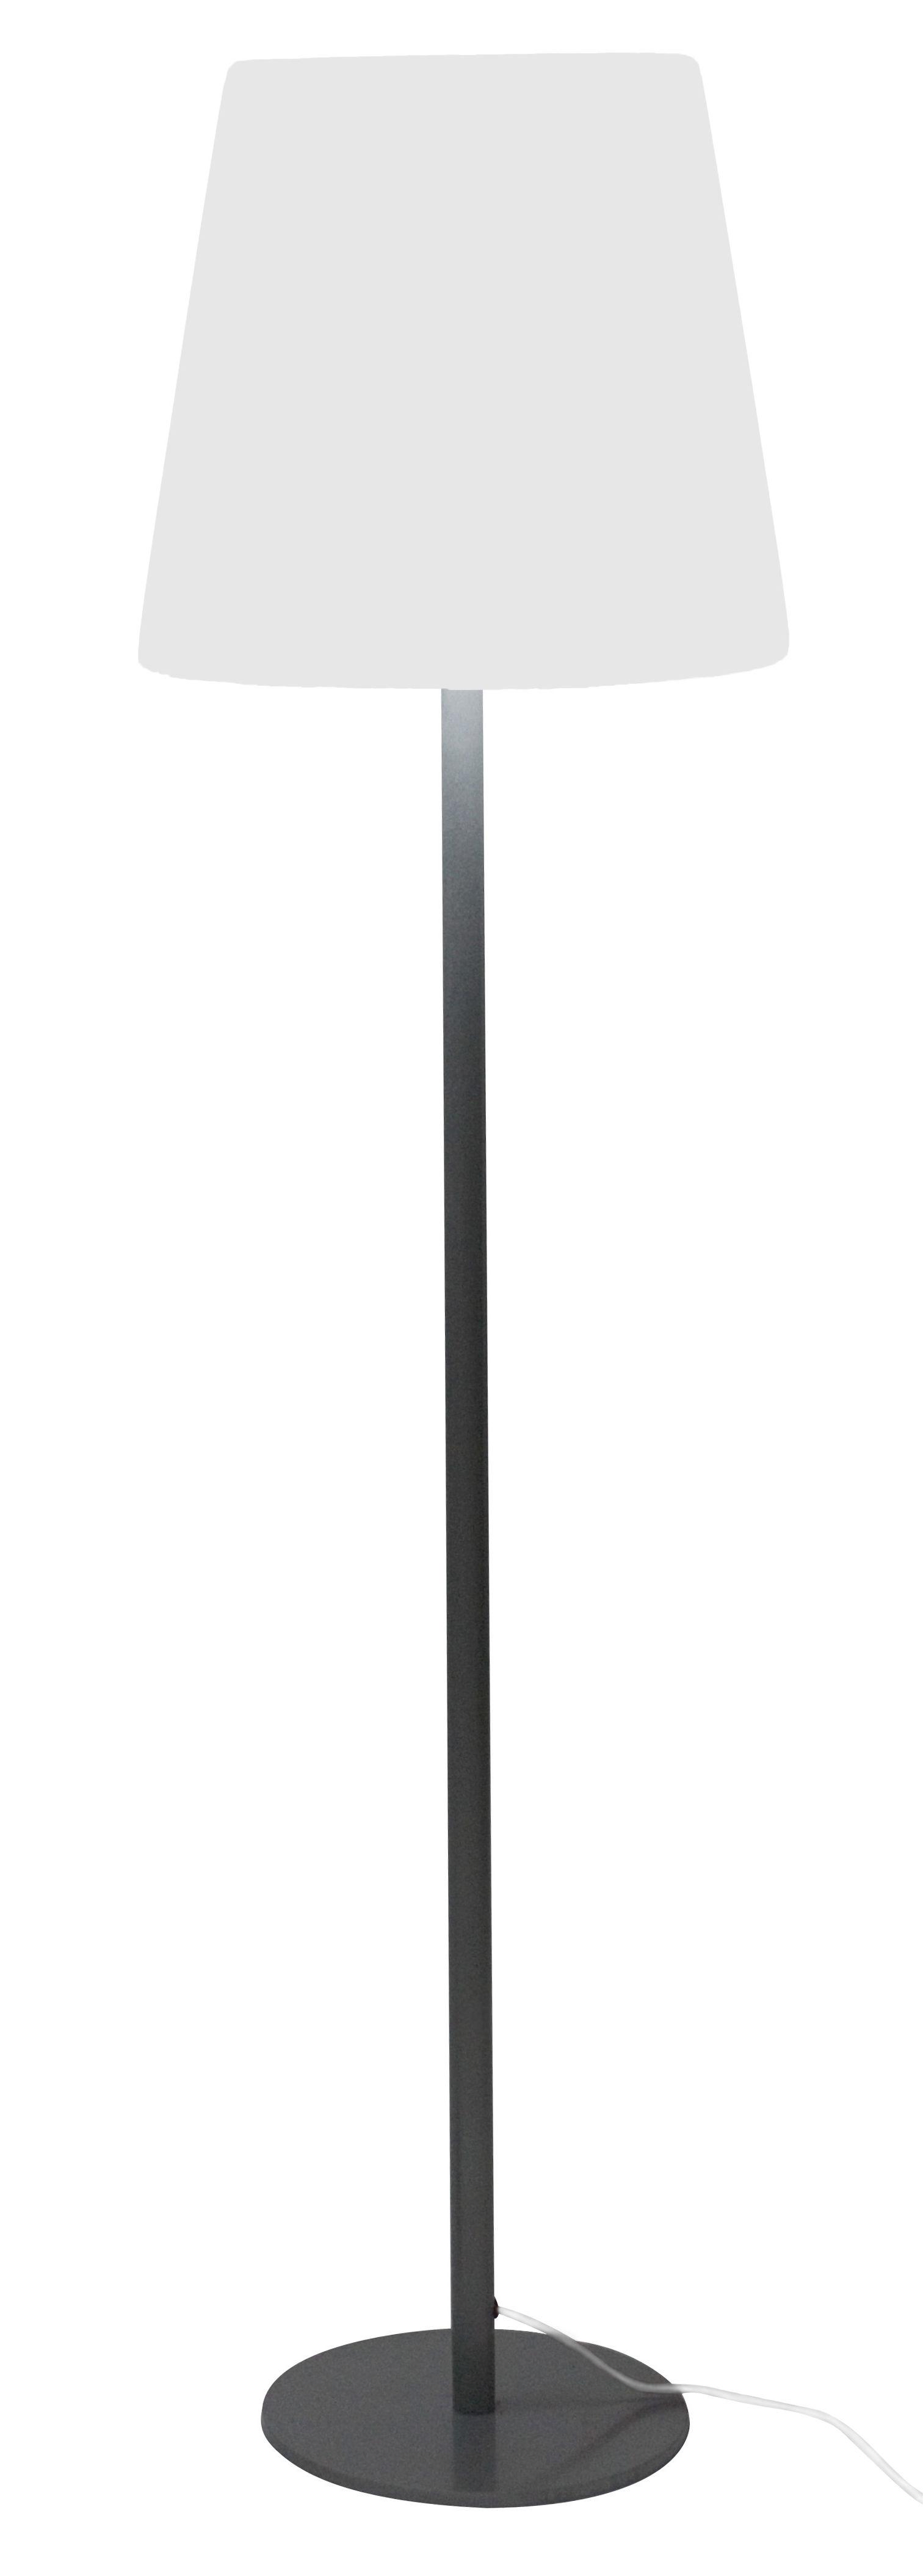 Luminaire - Lampadaires - Lampadaire Ali Baba - Slide - Version à poser : pied avec base - Inox, Polyéthylène recyclable